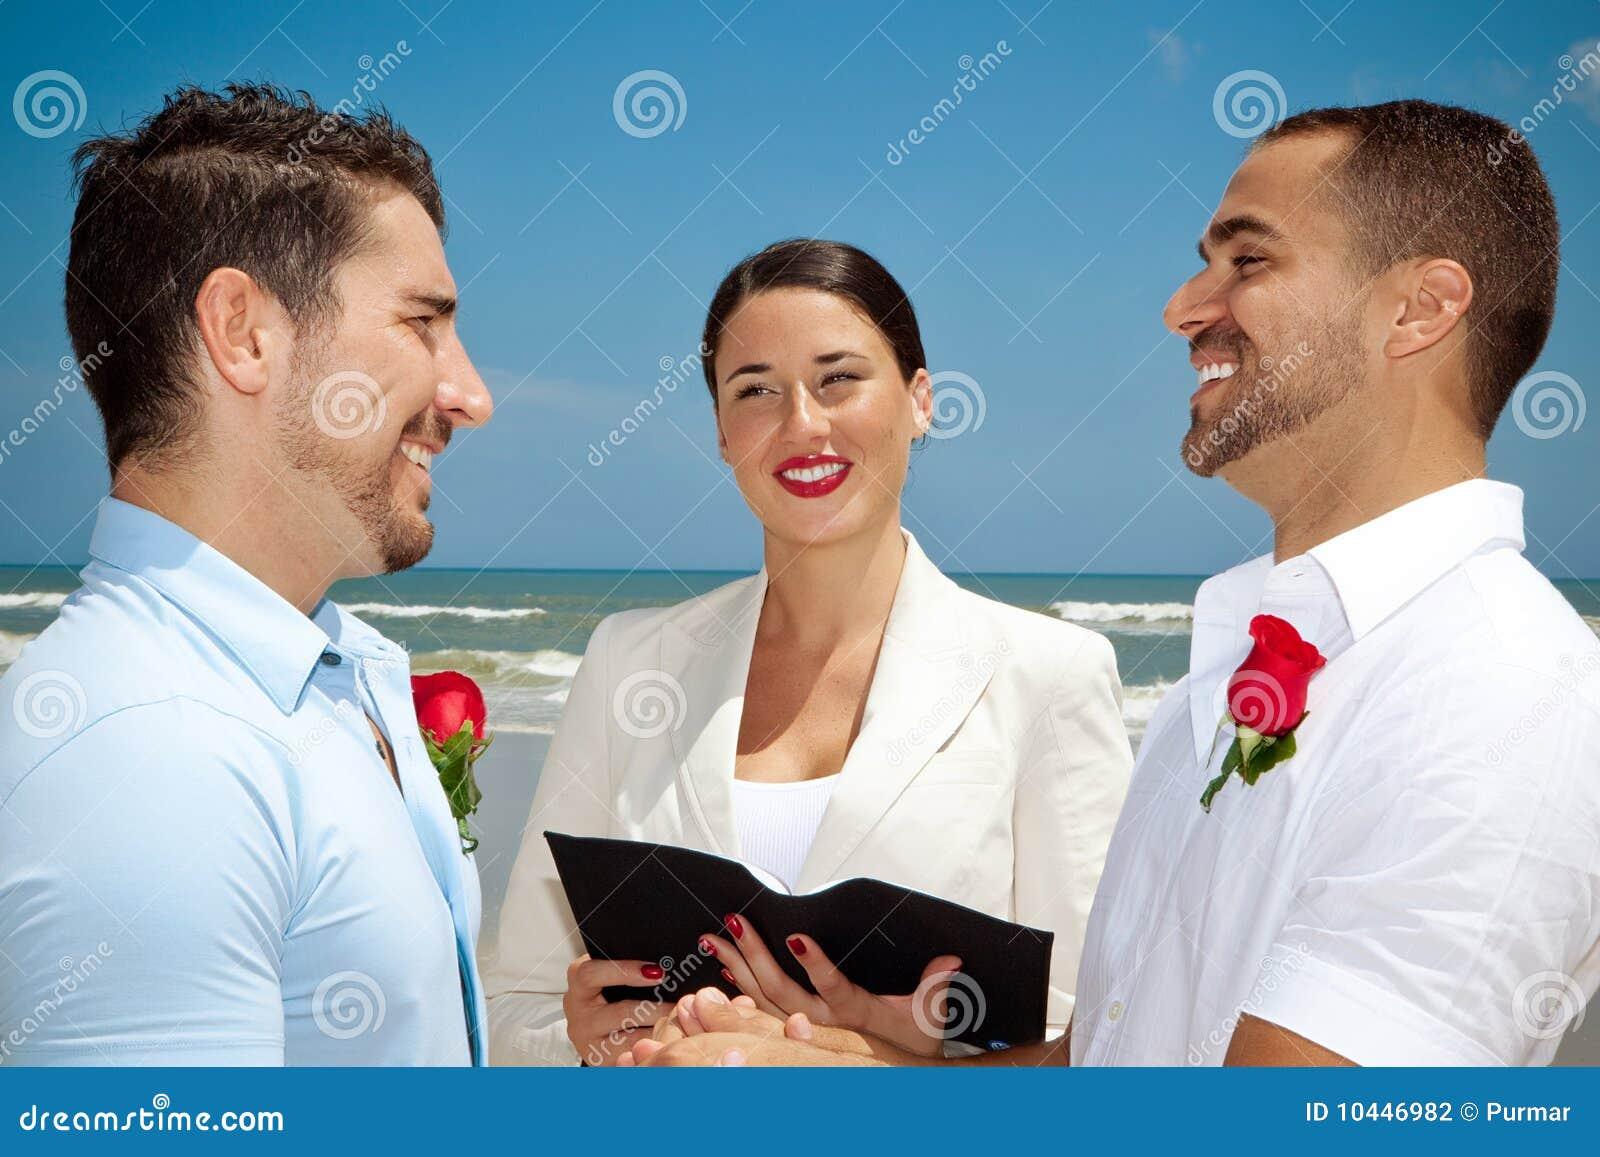 a gay wedding ceremony